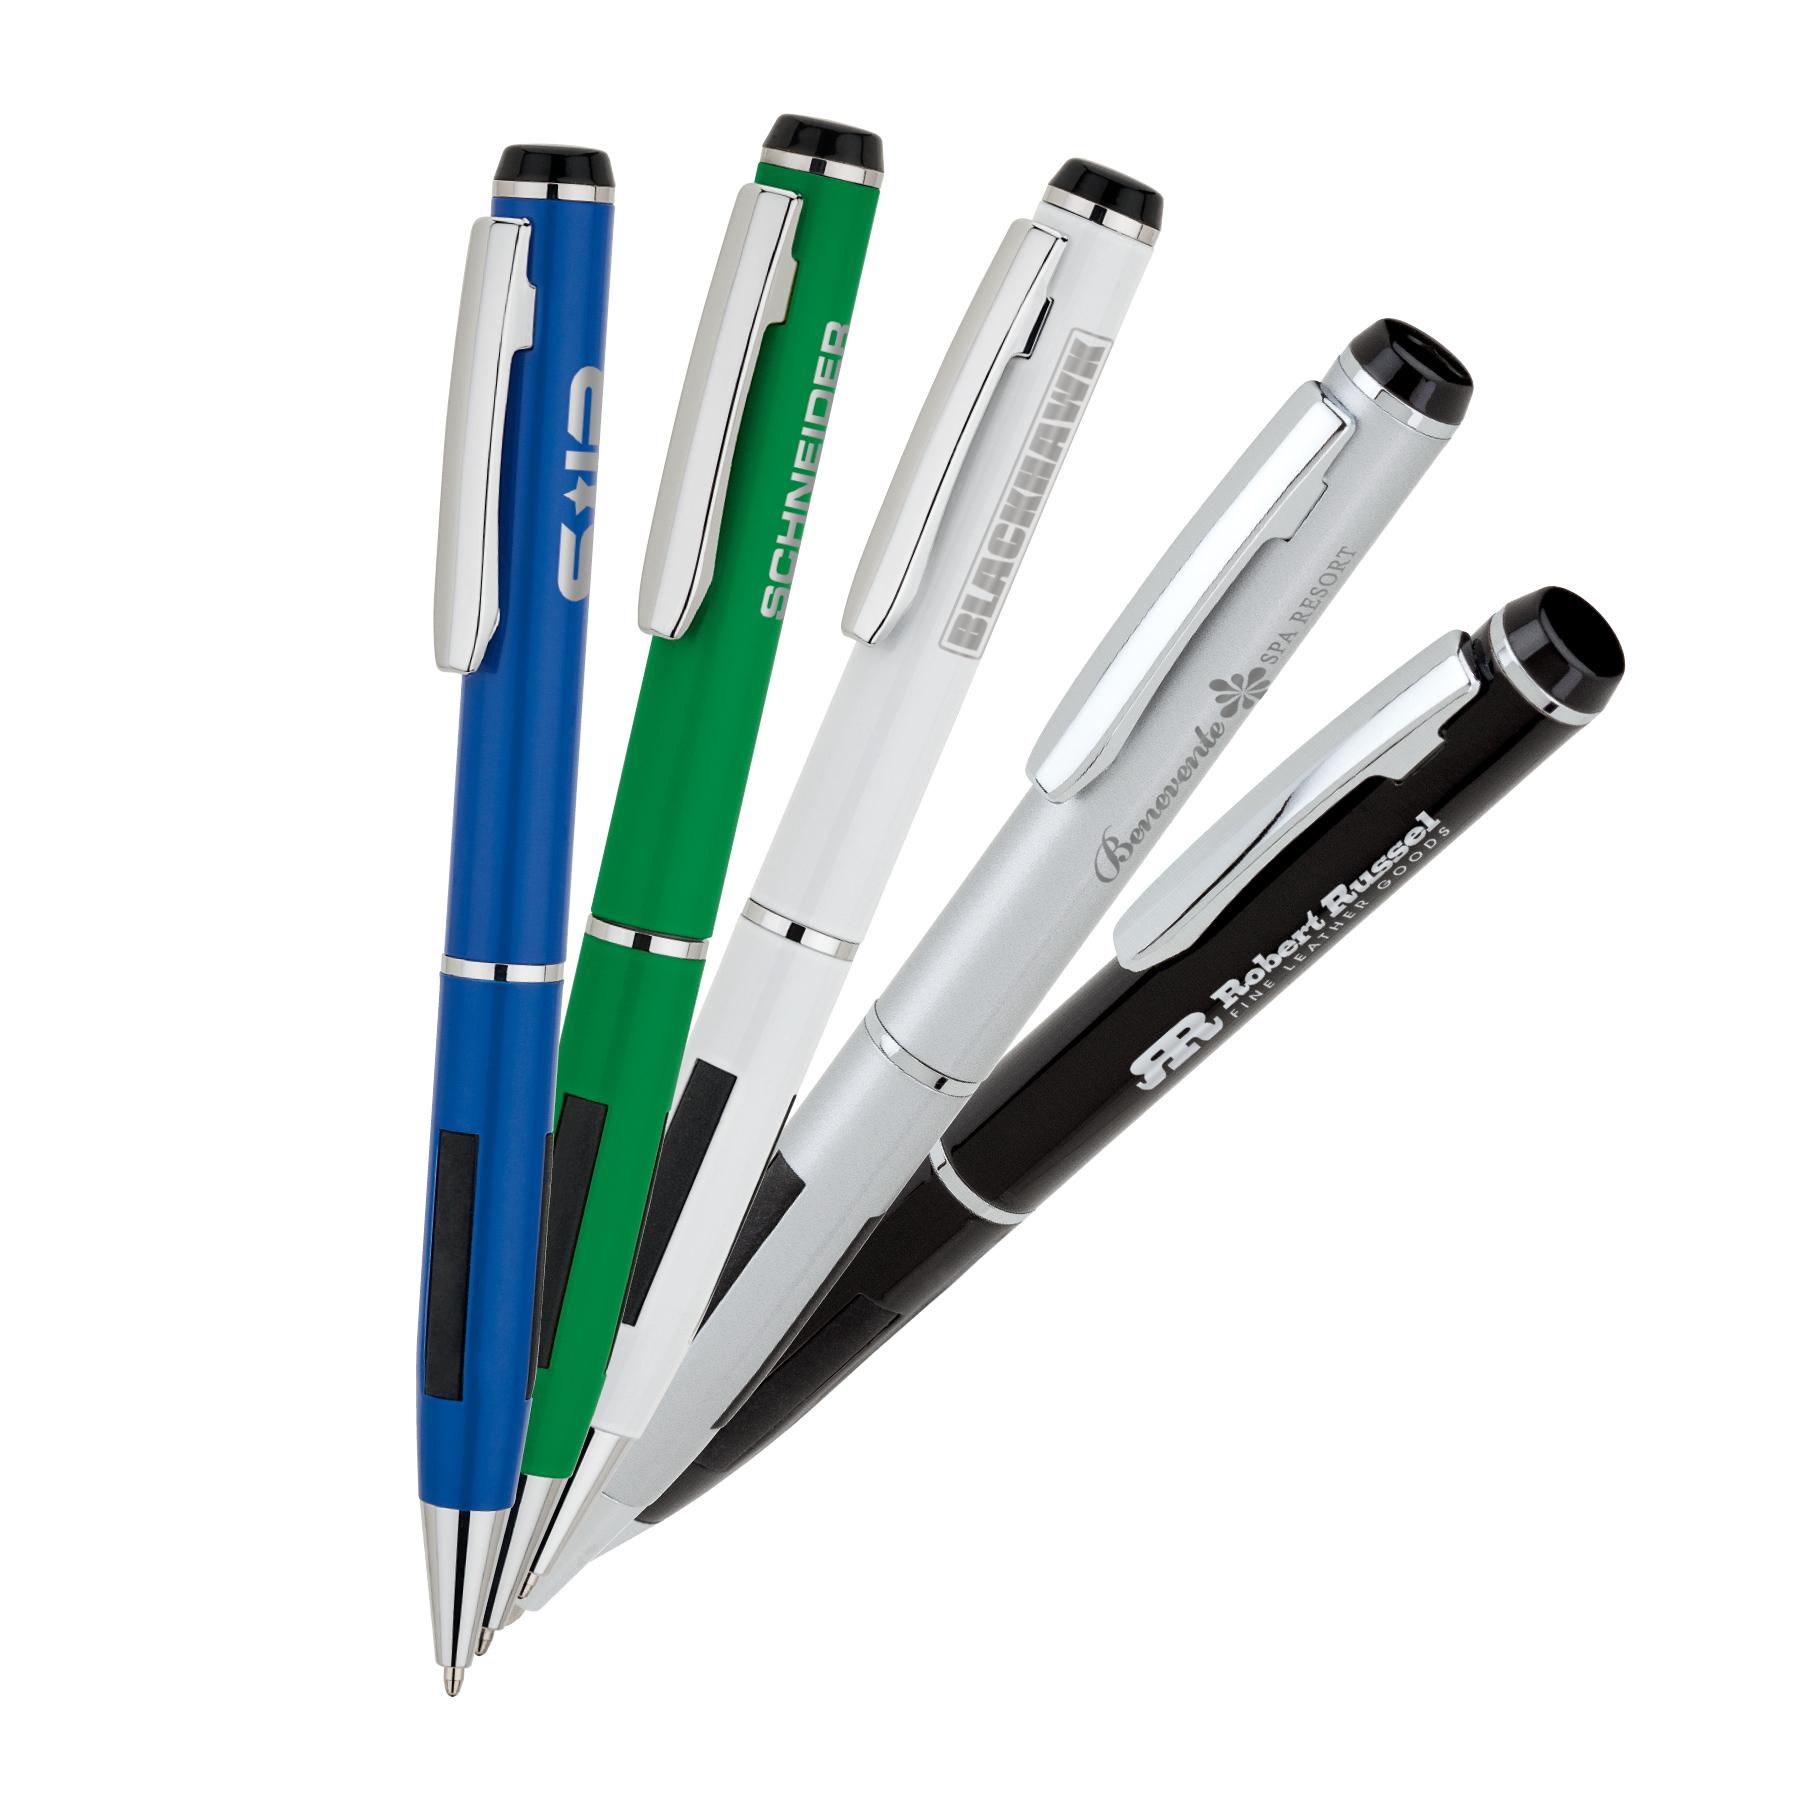 Metal Ballpoint Pen w/ Rubber Grip Accents